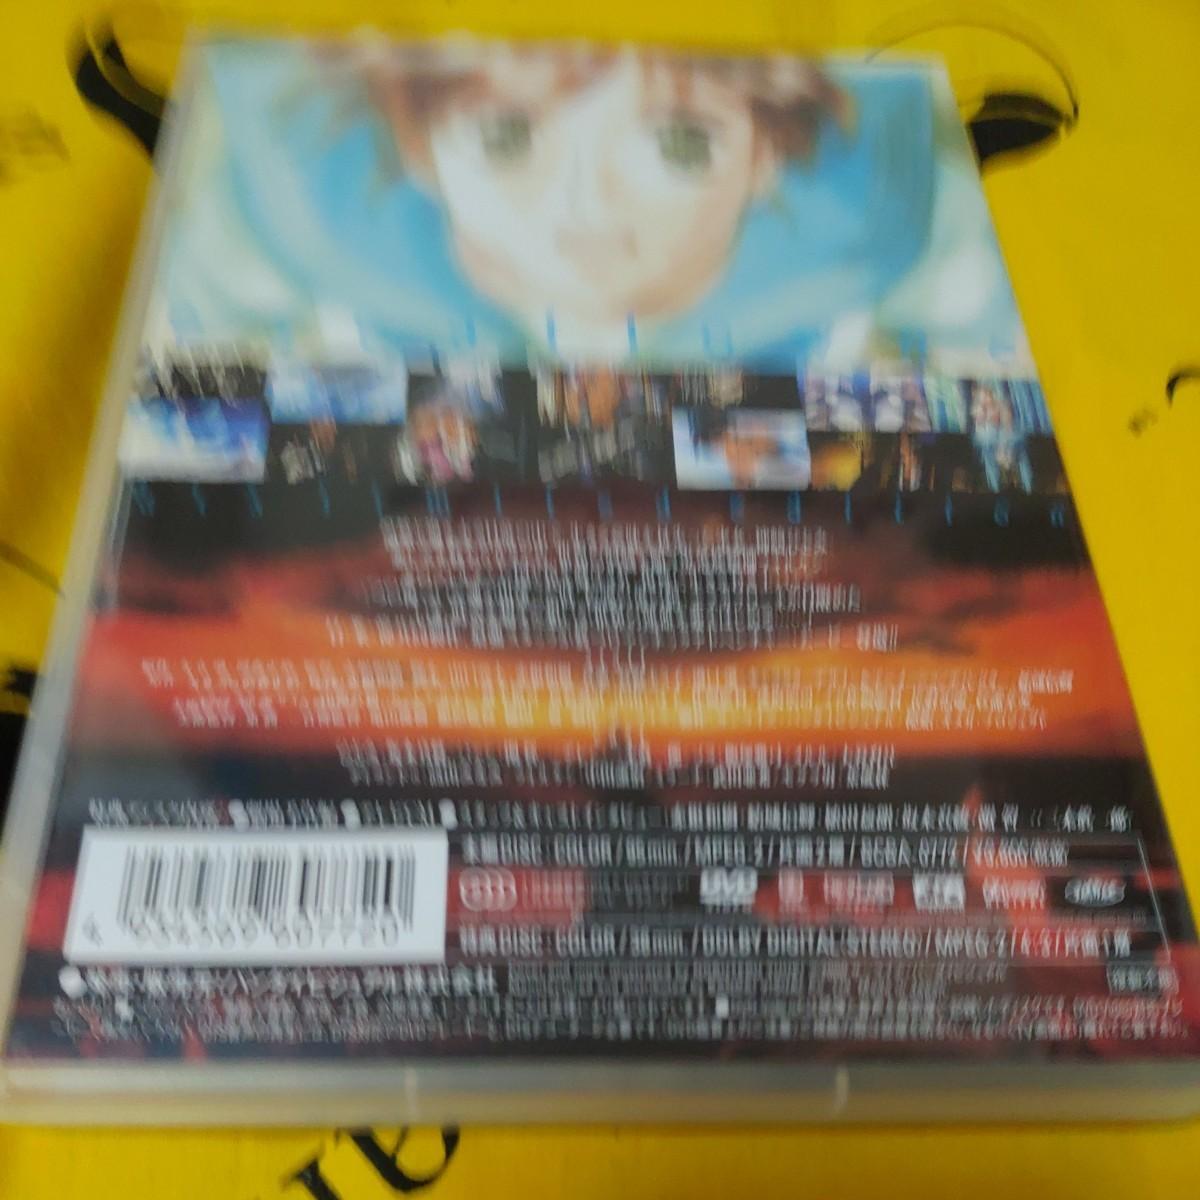 【DVD】エスカフローネ dts limited edition 初回限定生産